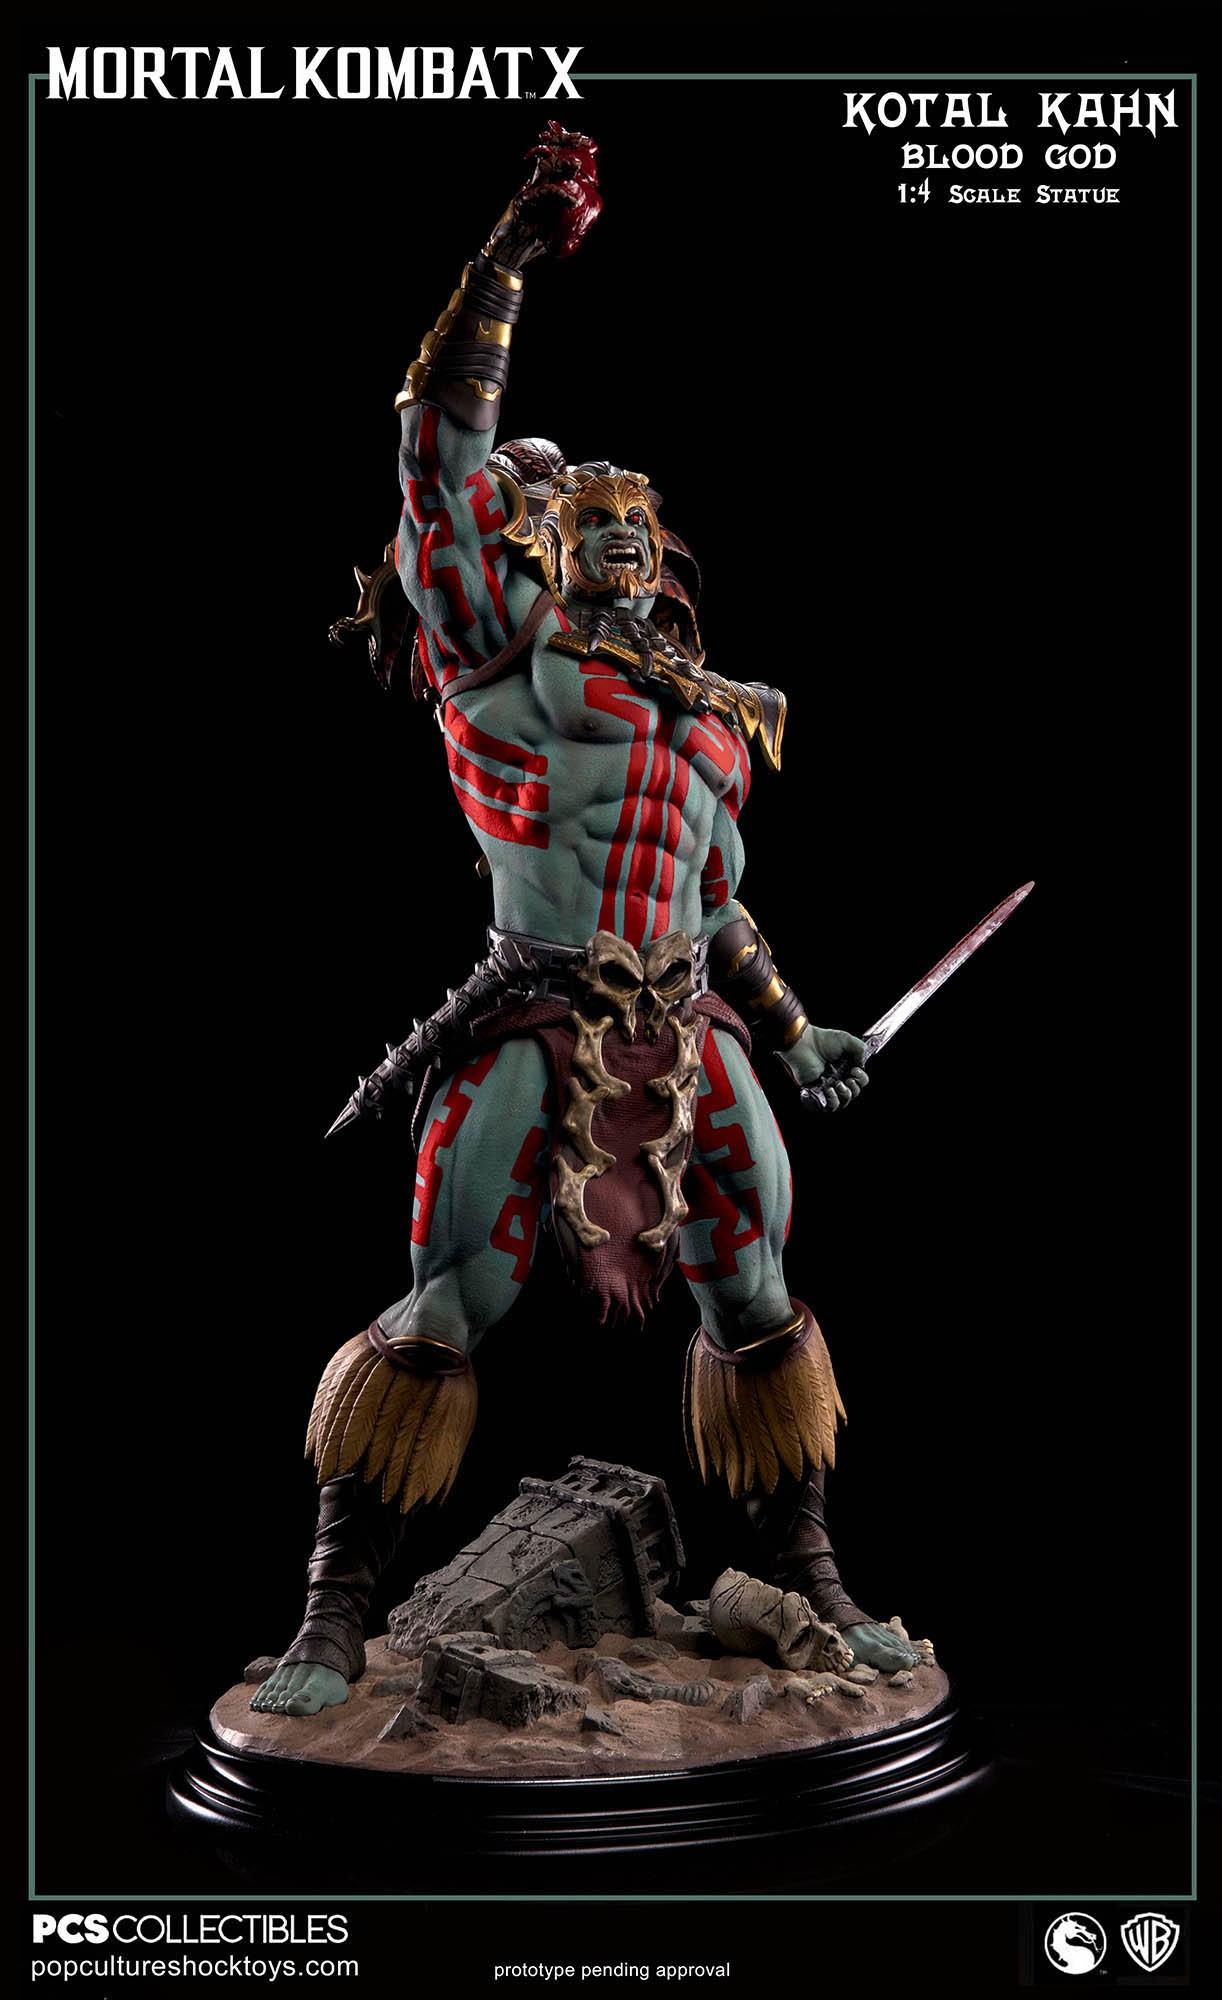 [Pop Culture Shock] Mortal Kombat X: Kotal Kahn 1:4 scale PCS-Kotal-Kahn-Blood-God-003